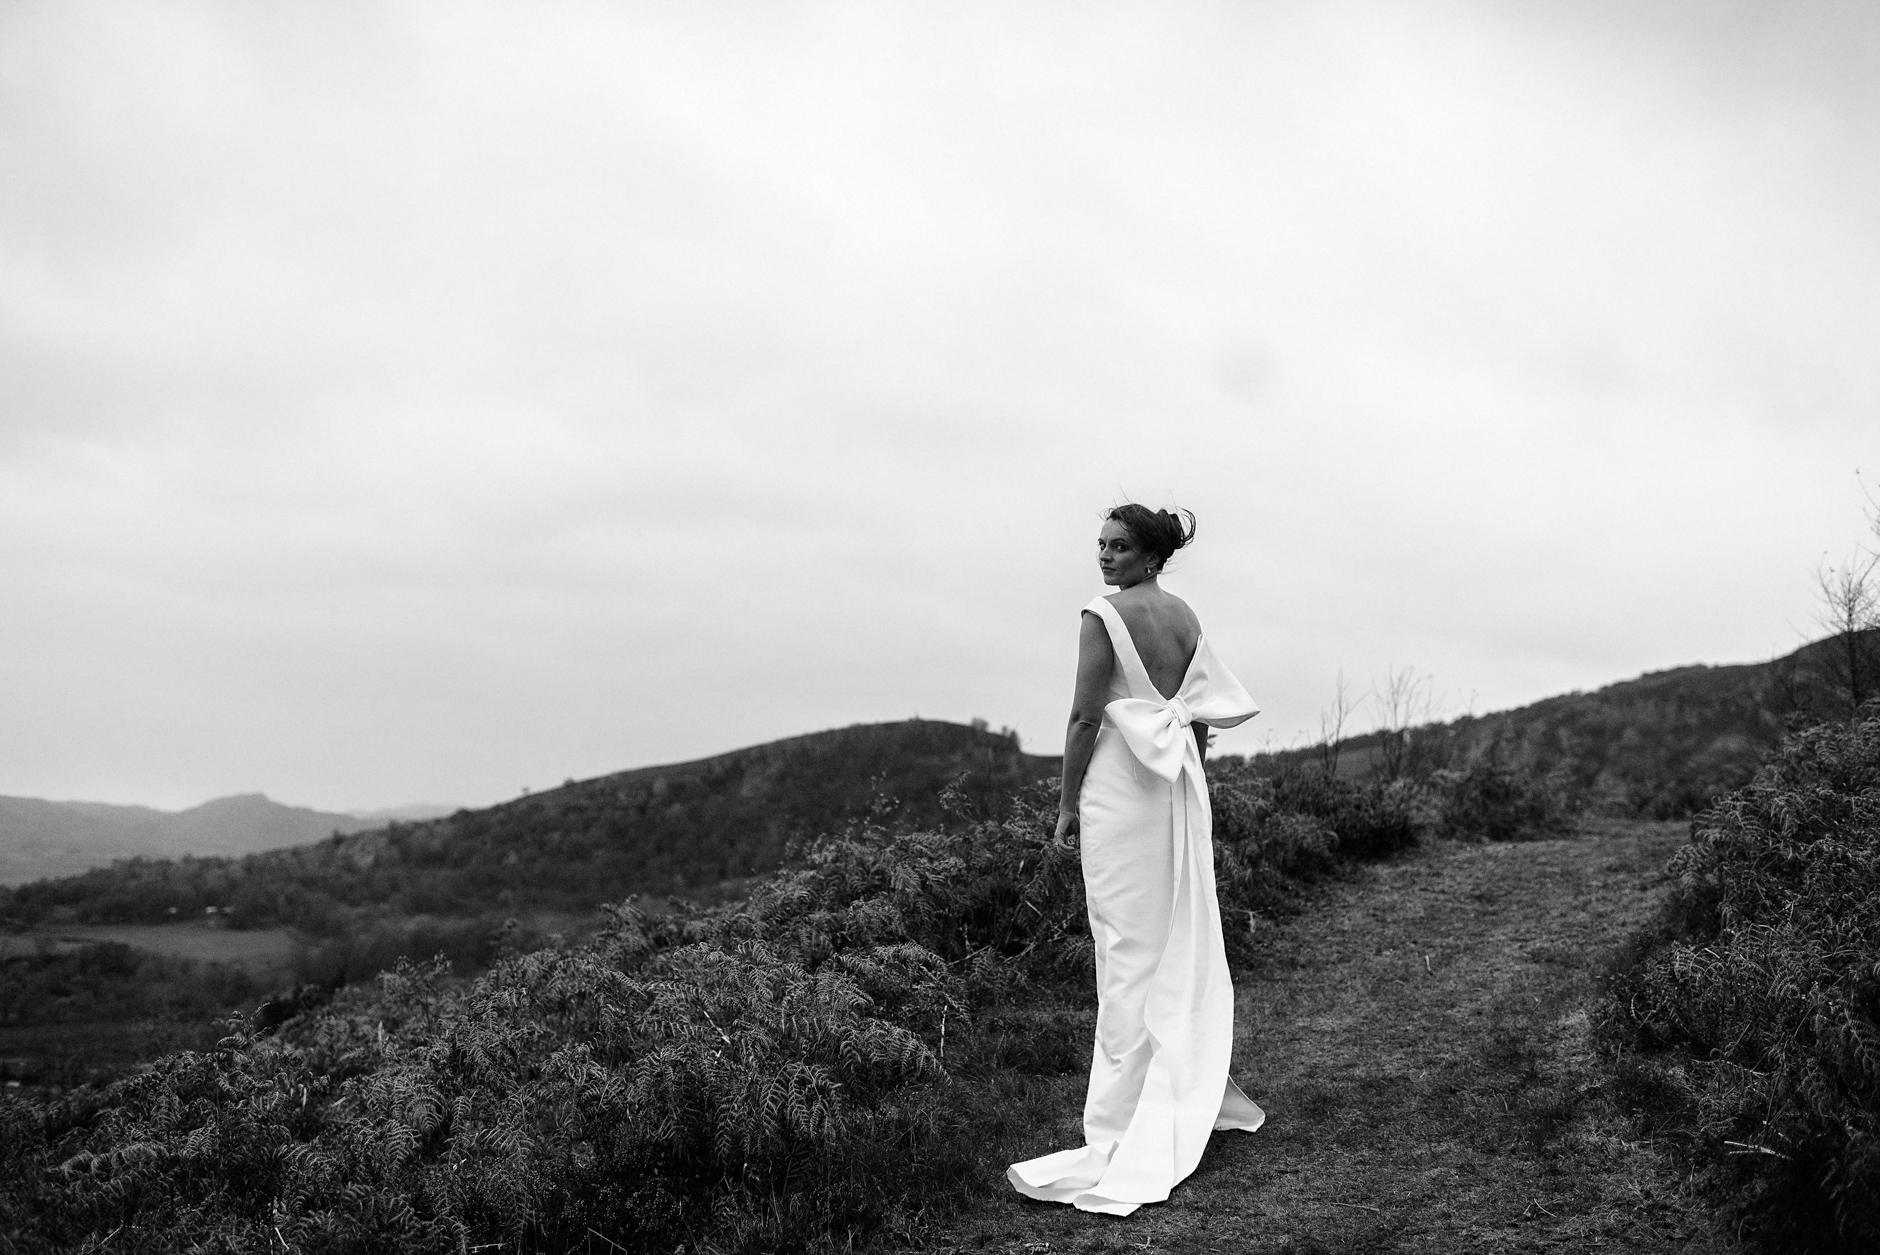 Glentruim-Wedding-Nikki-Leadbetter-Photography-195.jpg